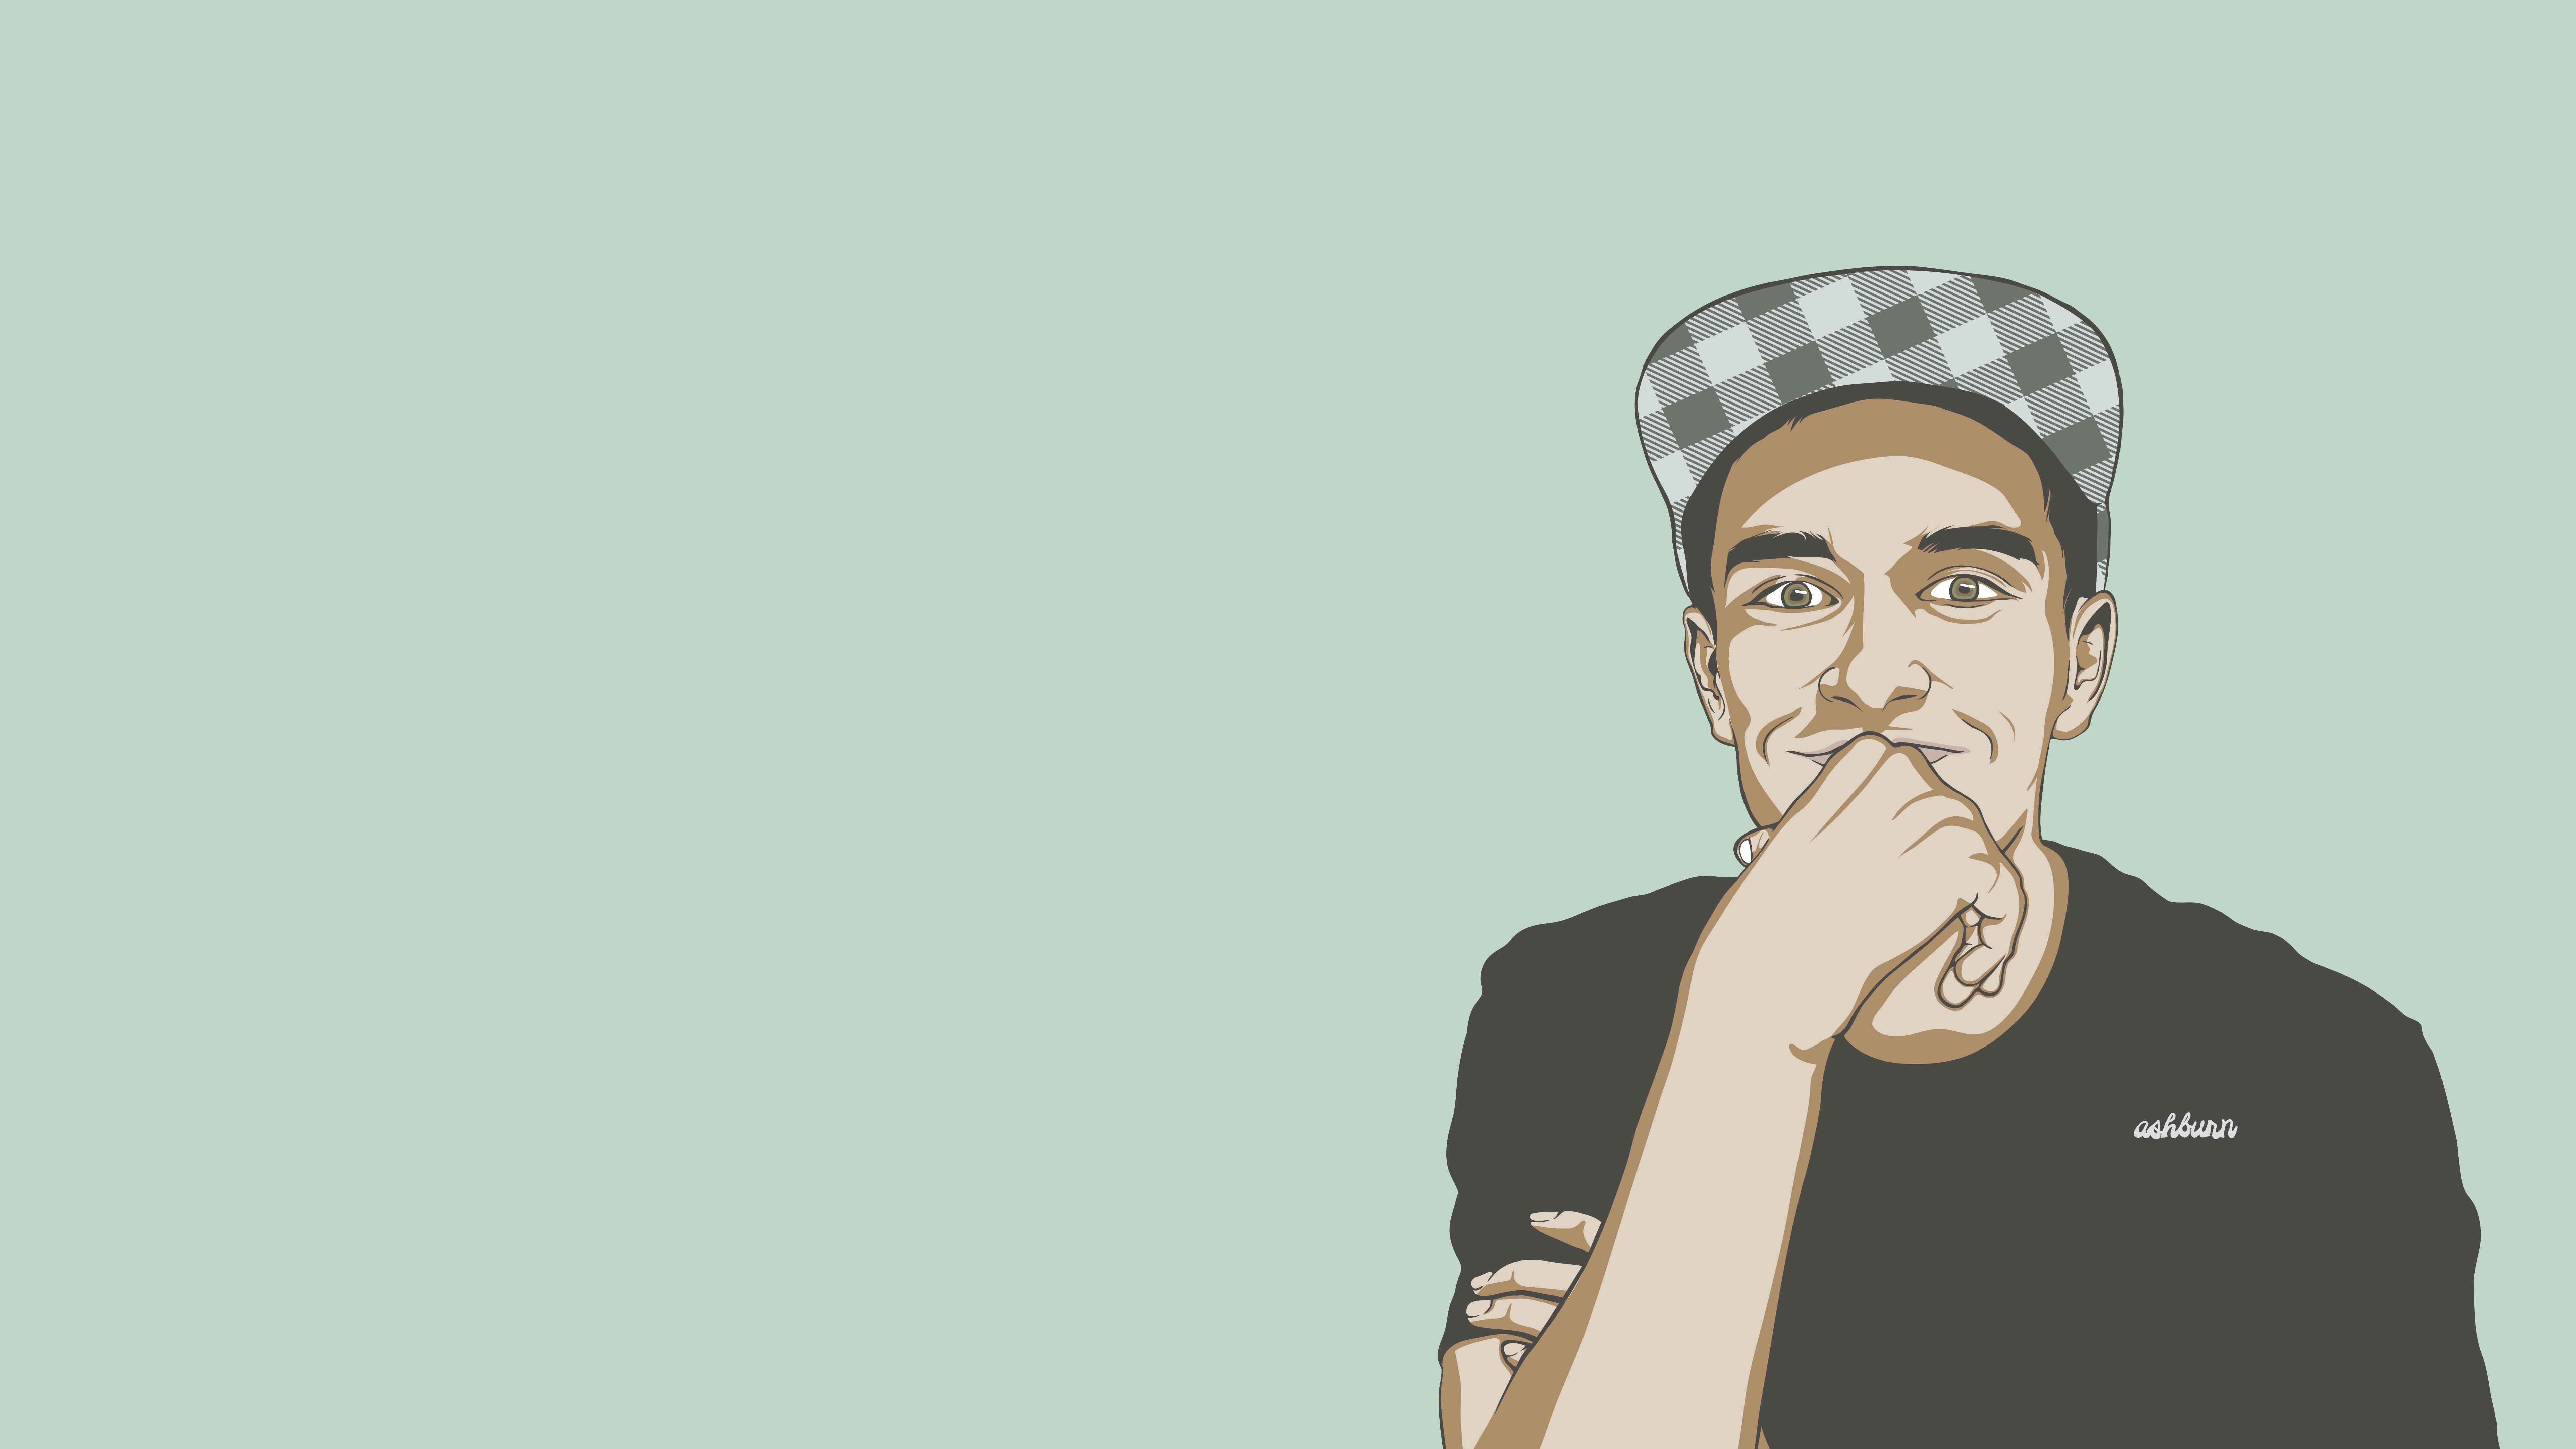 Ryan Ashburn Illustration Portrait